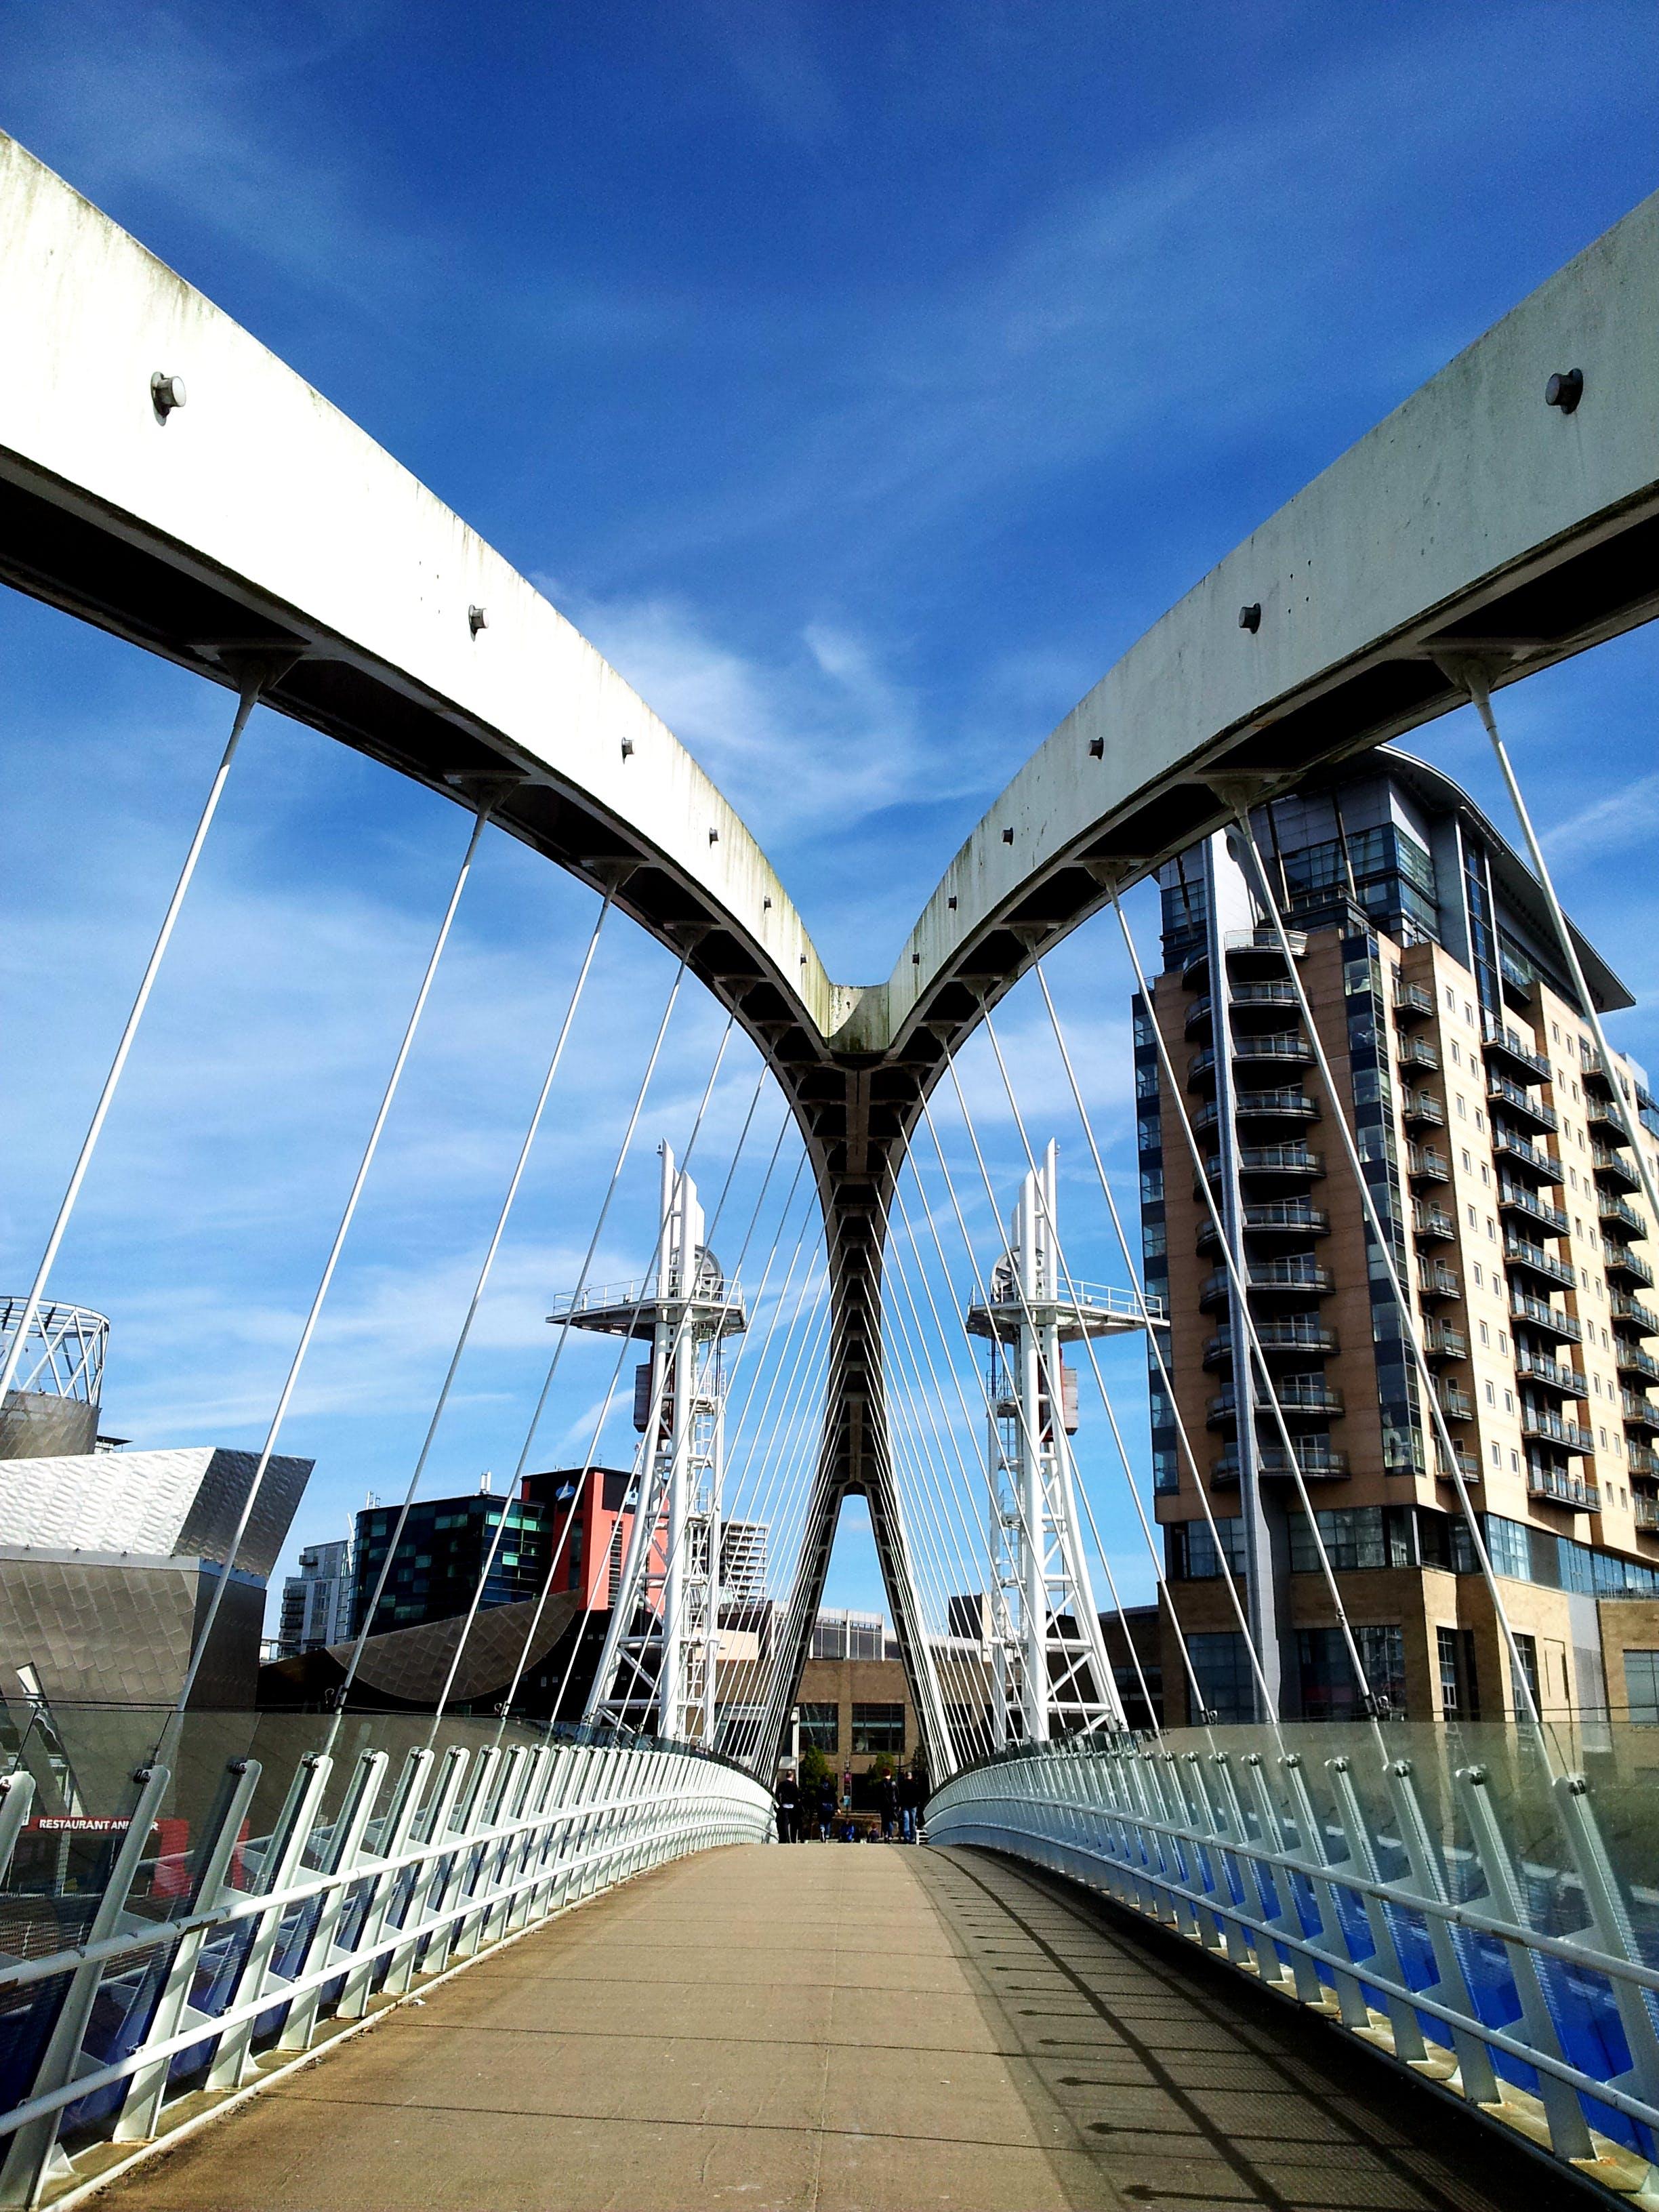 White Bridge Under Blue Sky